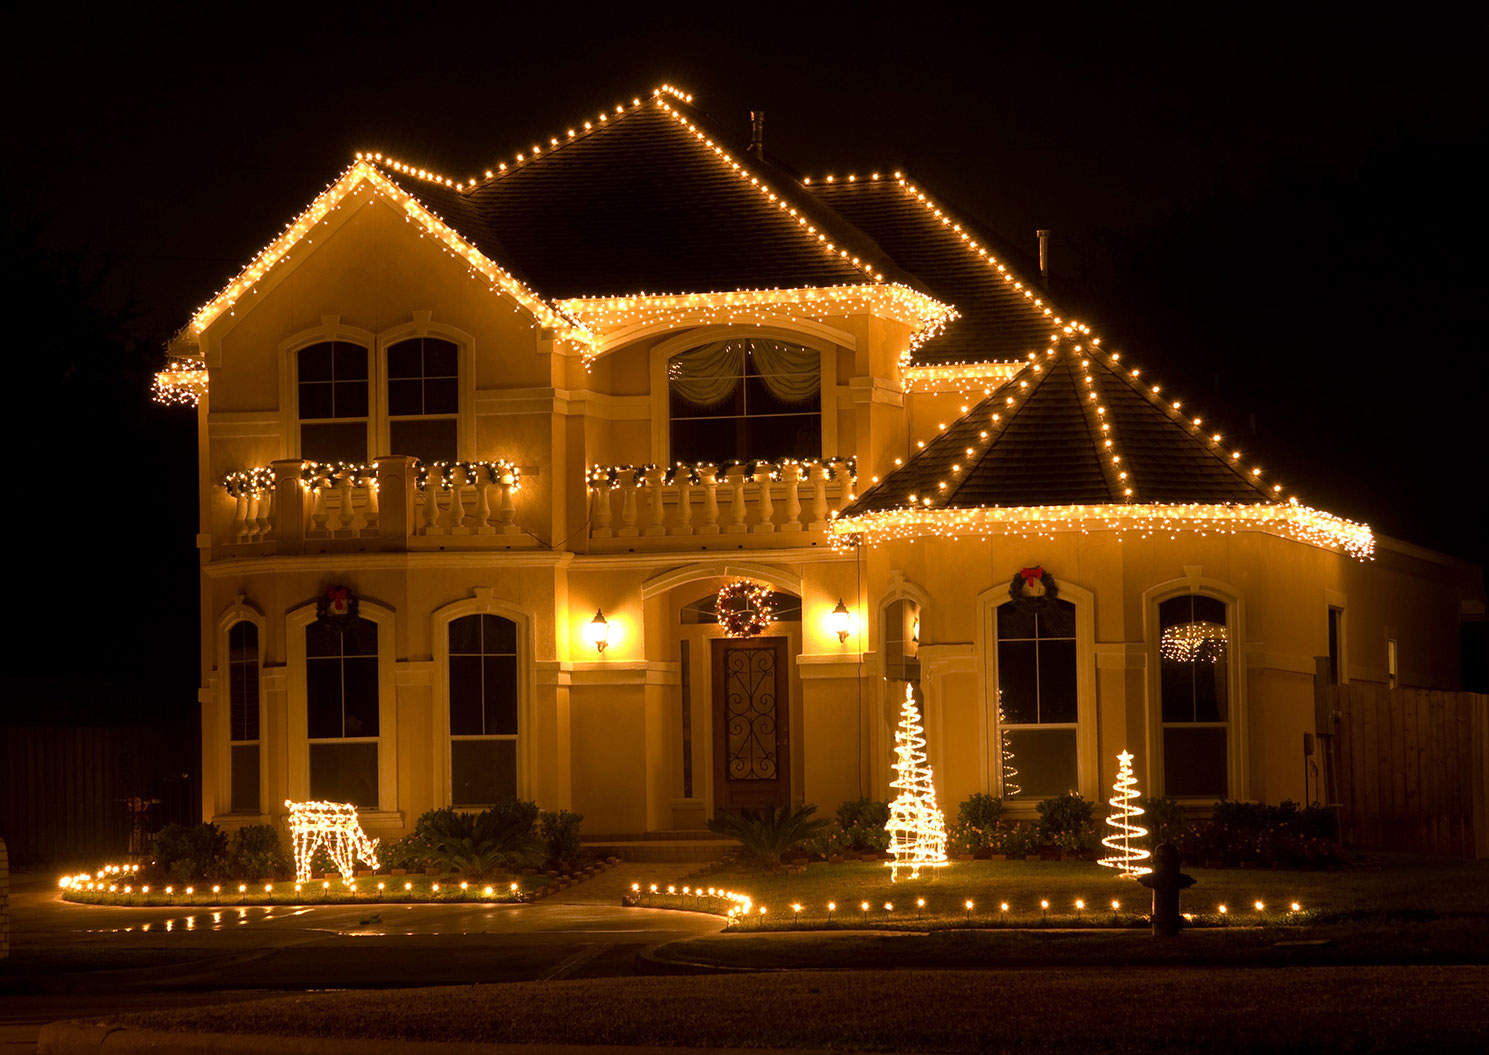 Professional Christmas light installation in Princeton, NJ